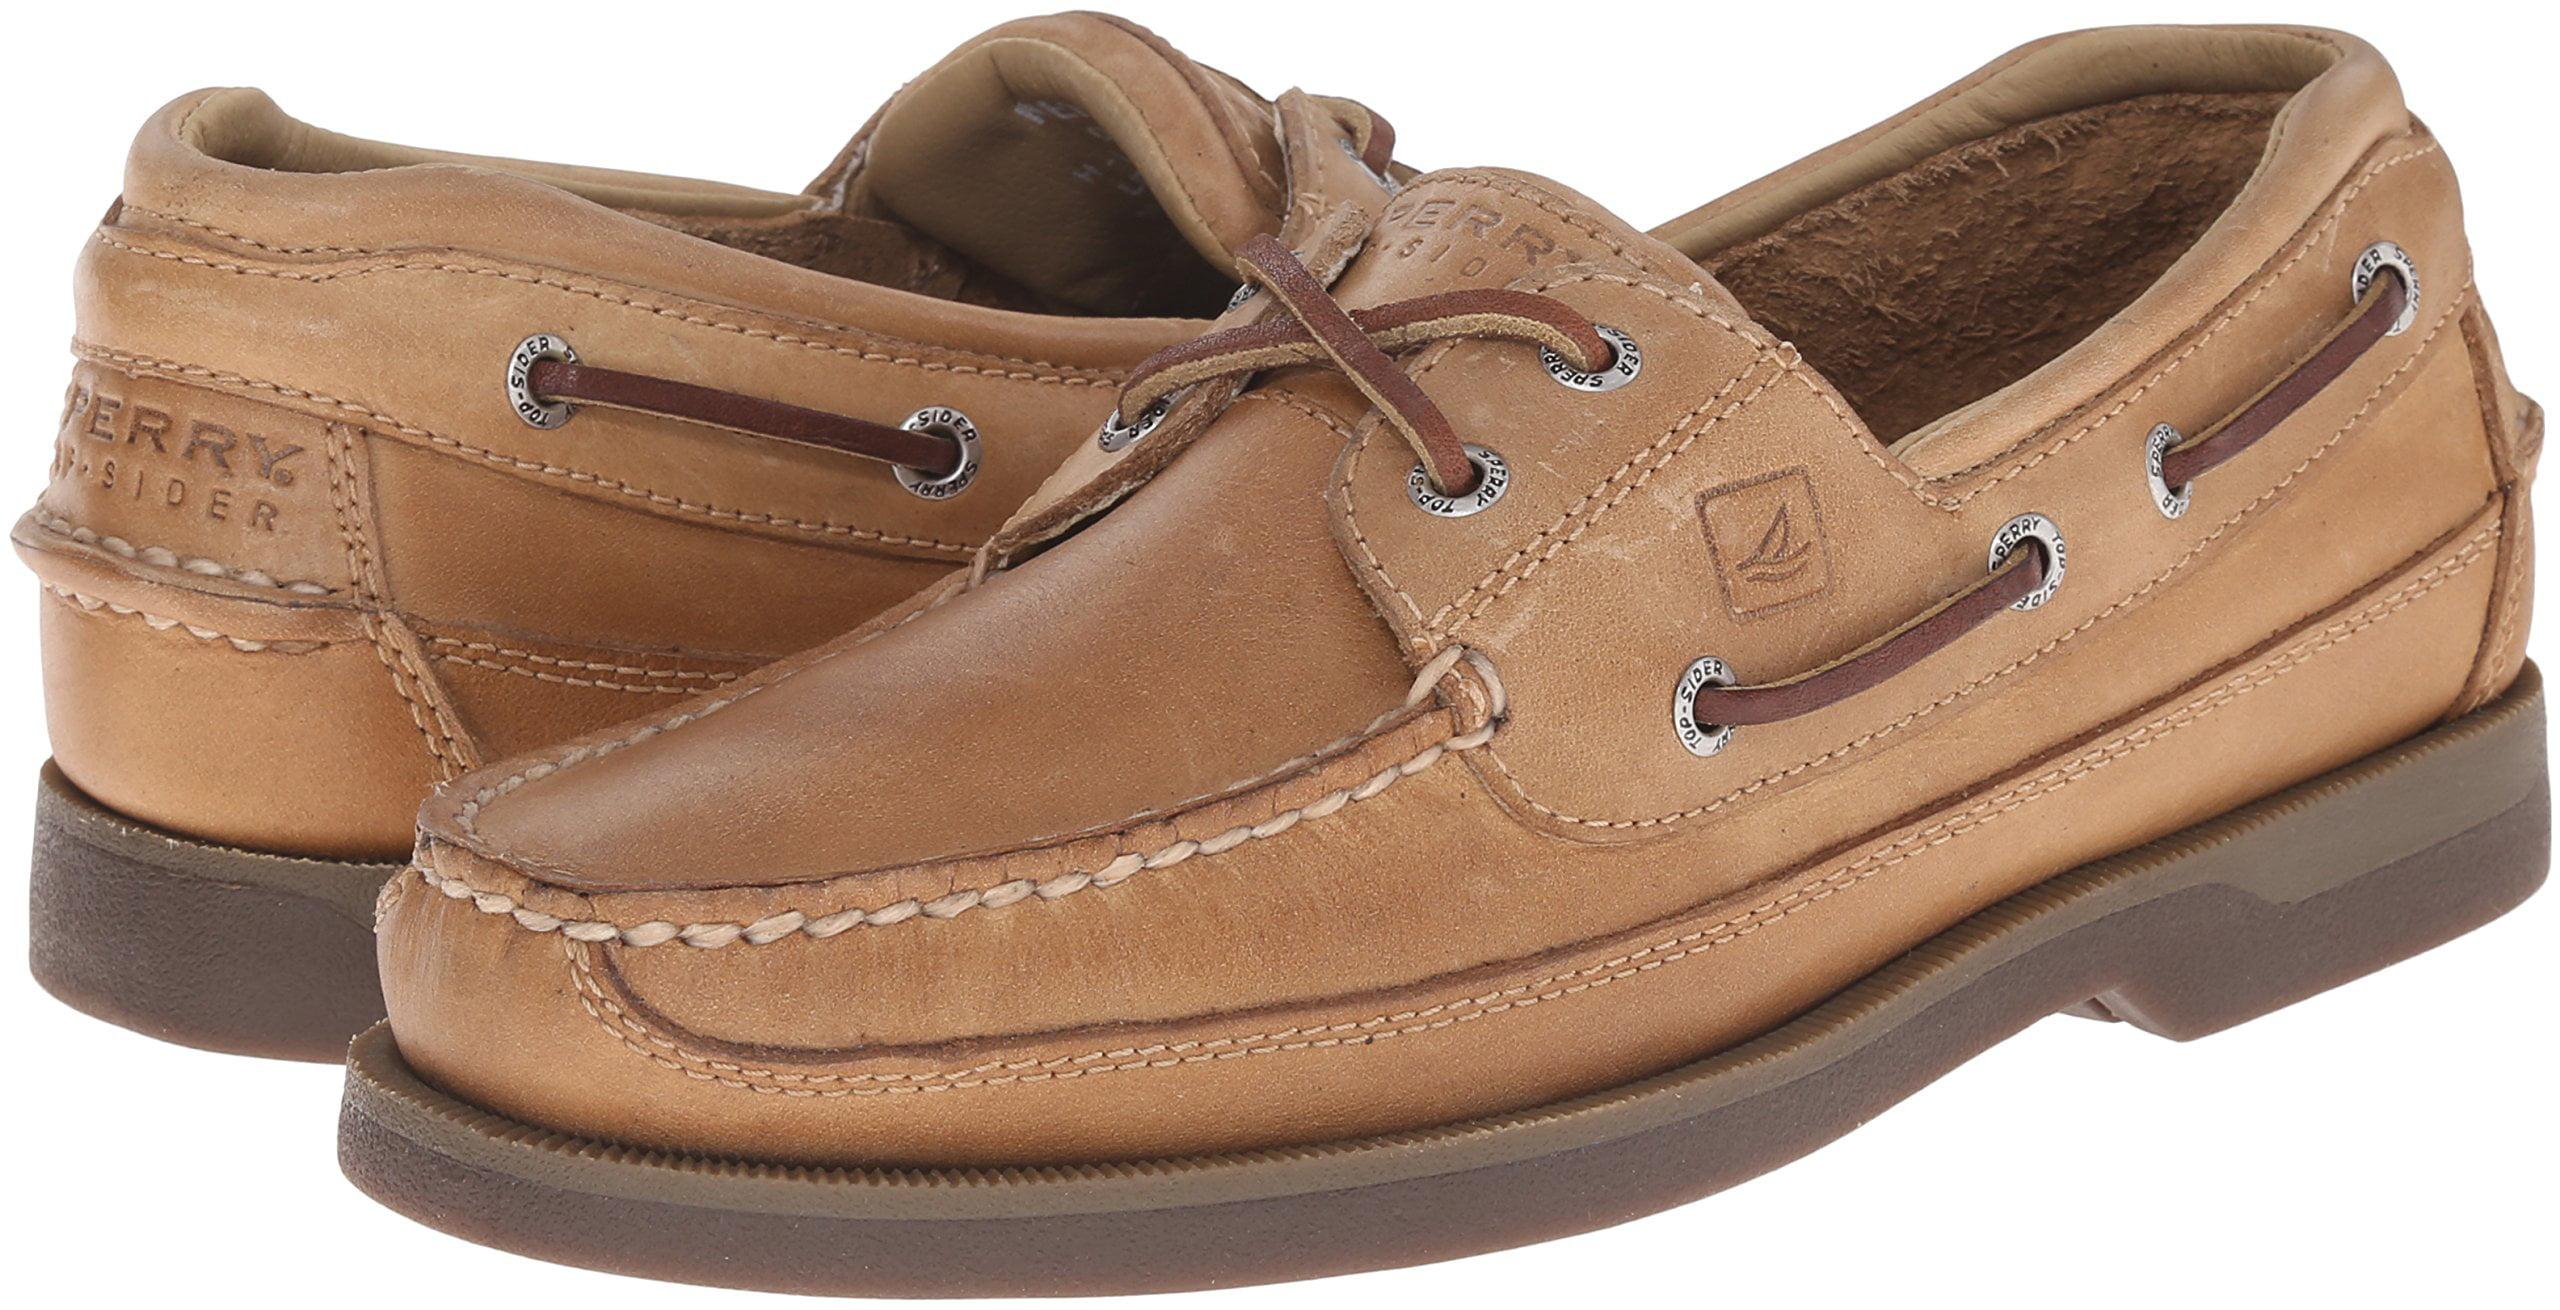 Sperry Top-Sider Mako 2-Eye Mens Oak Boat Shoes